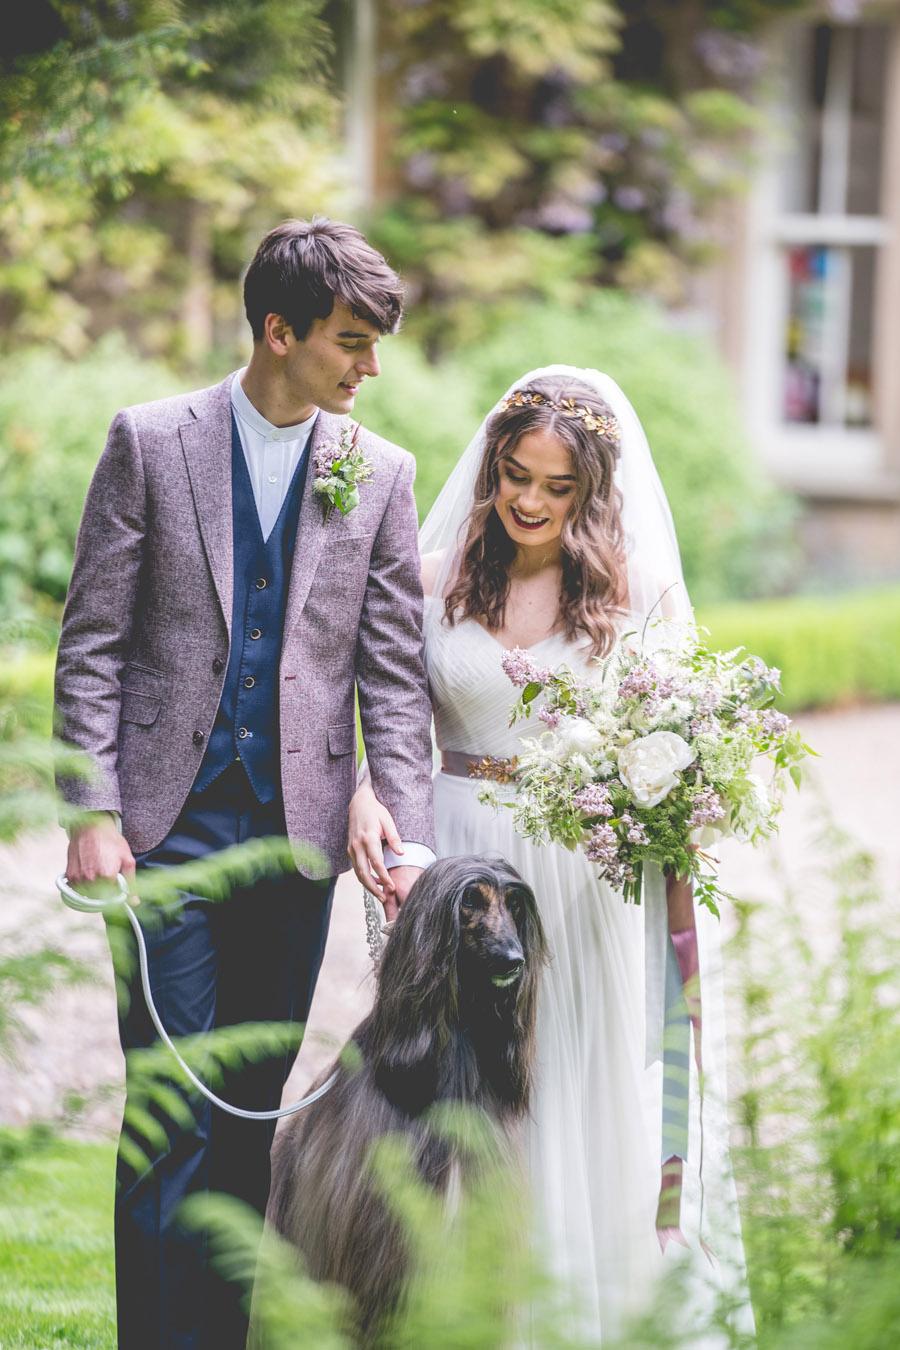 Eshott Hall wedding inspiration, credit Sean Elliott Photography (17)